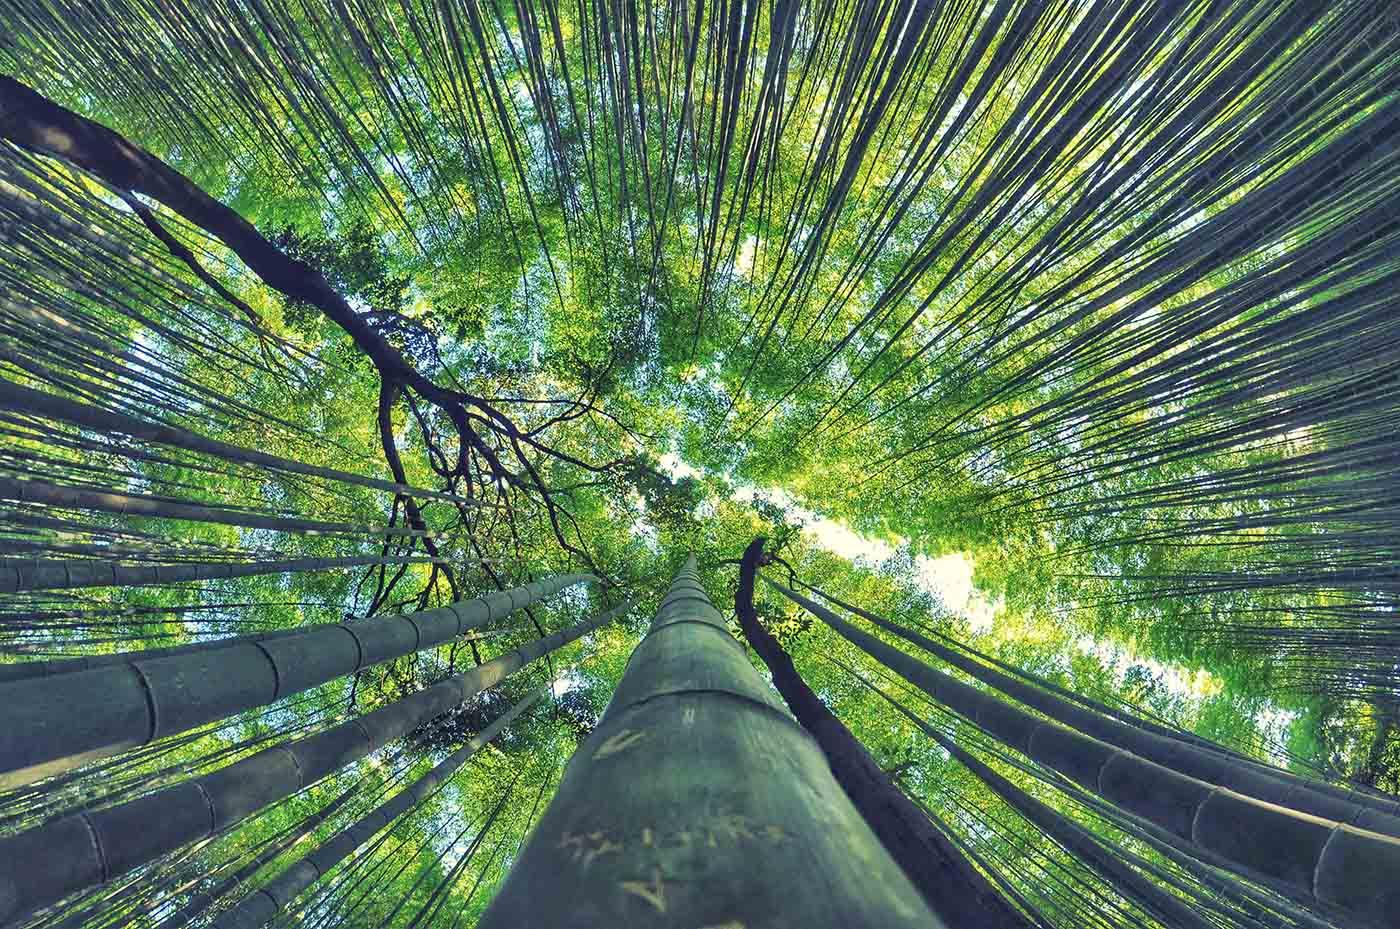 bamboo flute raag